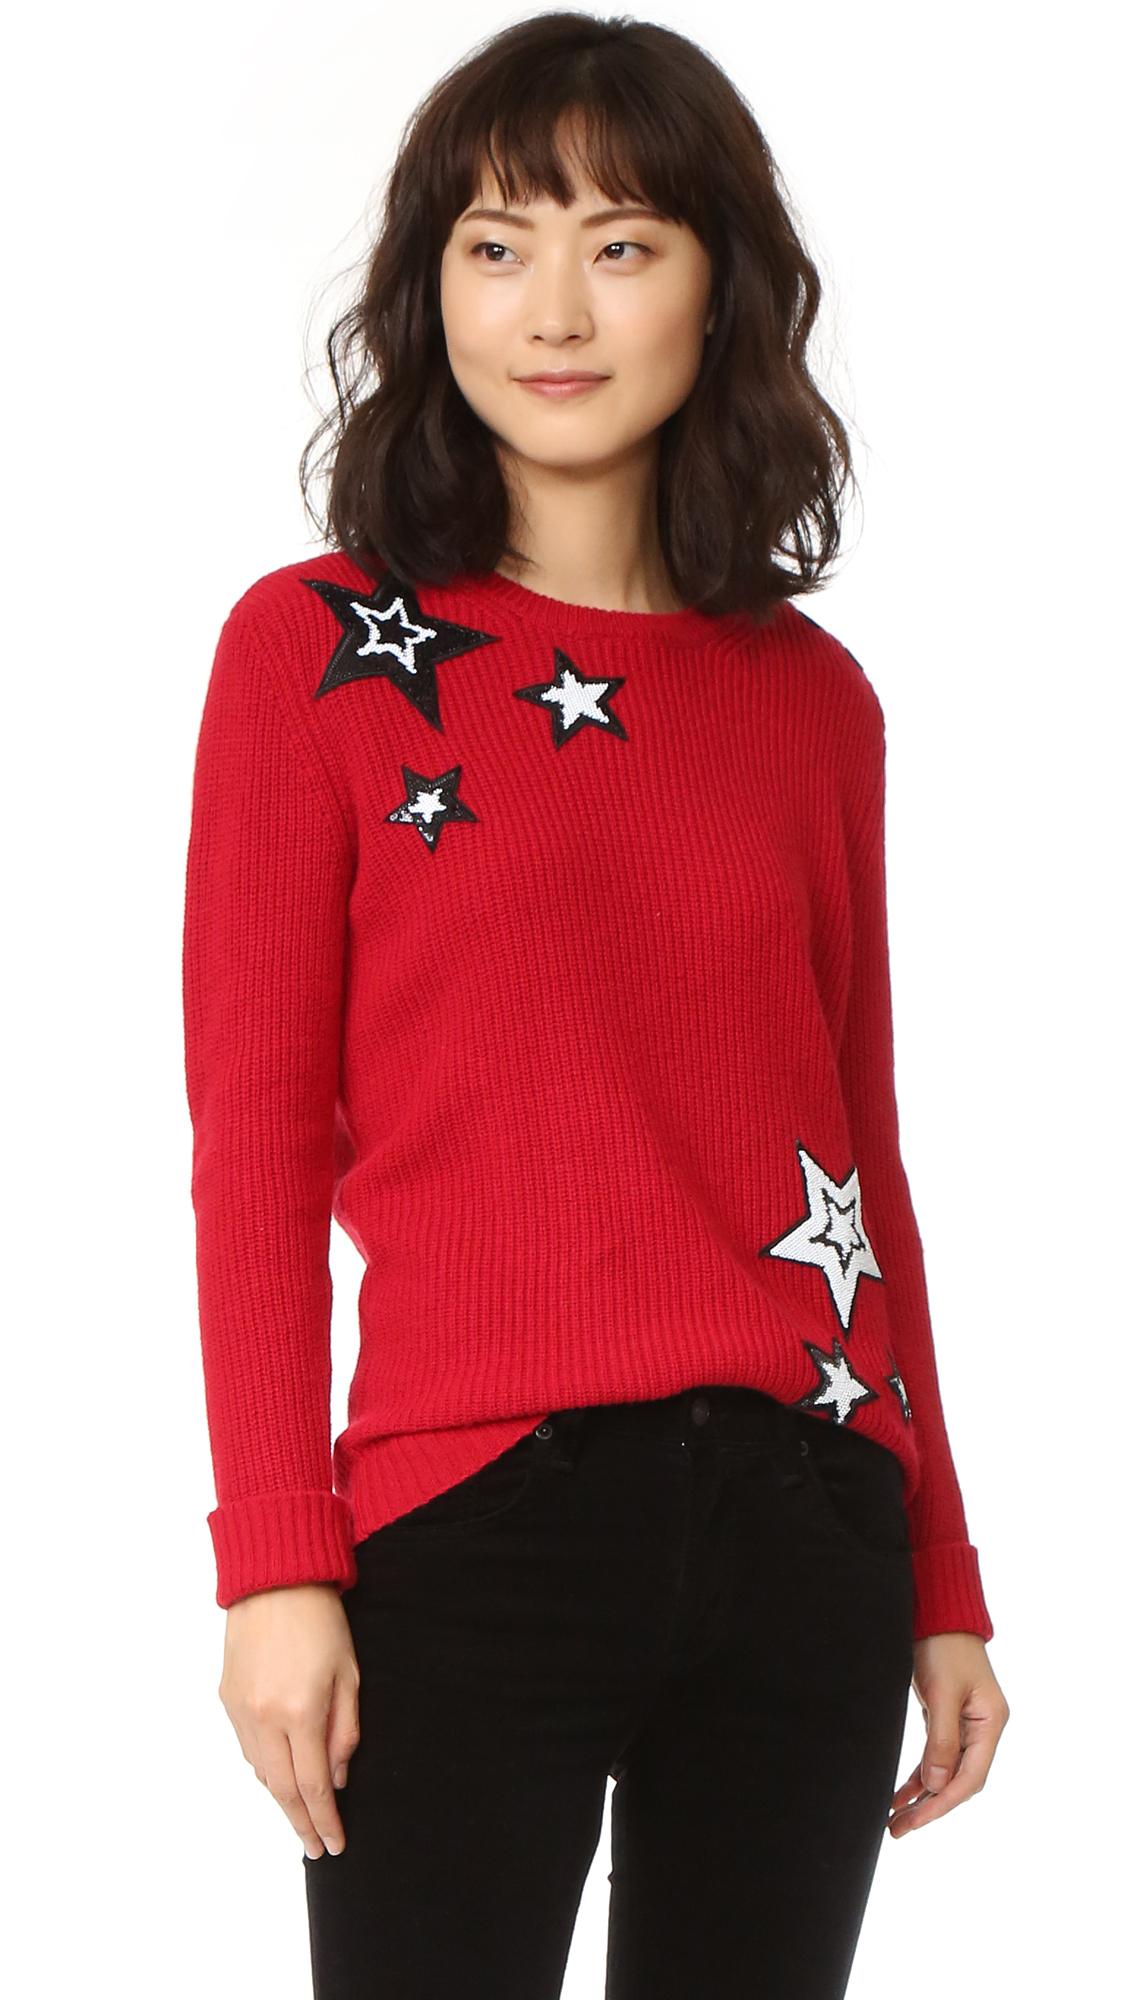 Rebecca Minkoff Prim Sweater With Sequin Stars - Red